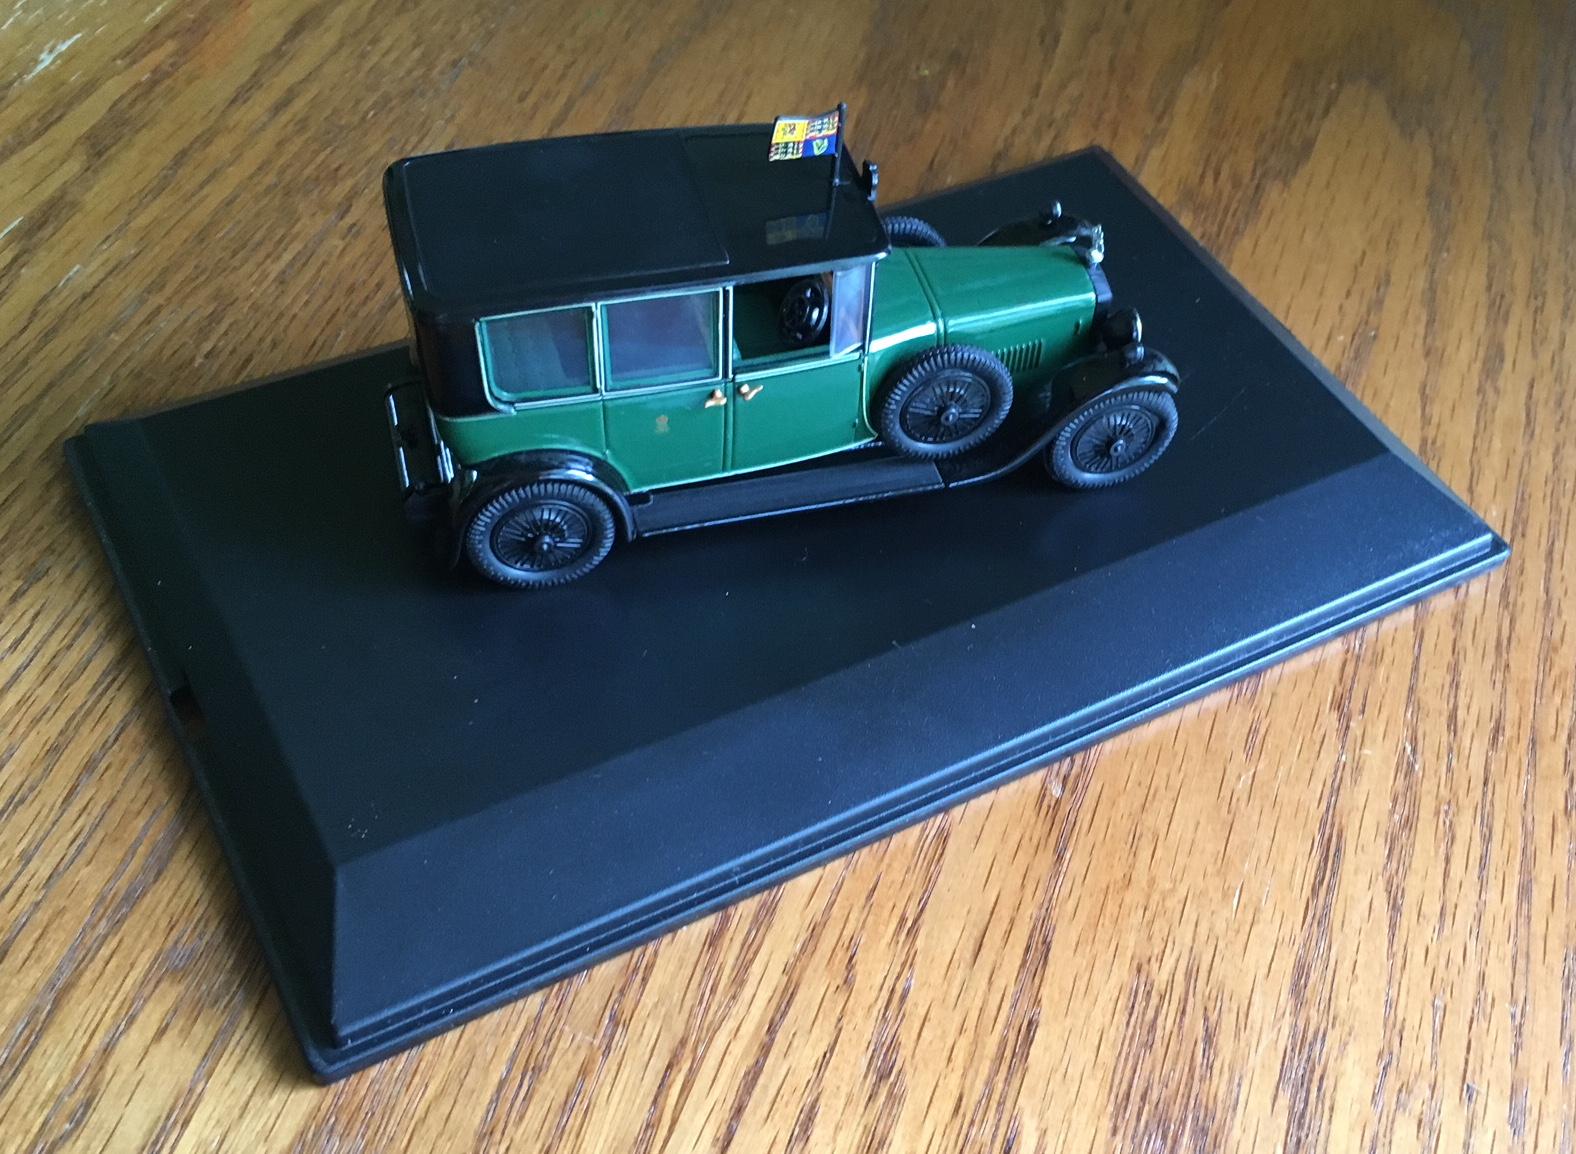 Diecast Metal Vehicles - Oxford Diecast - RD002 - Green